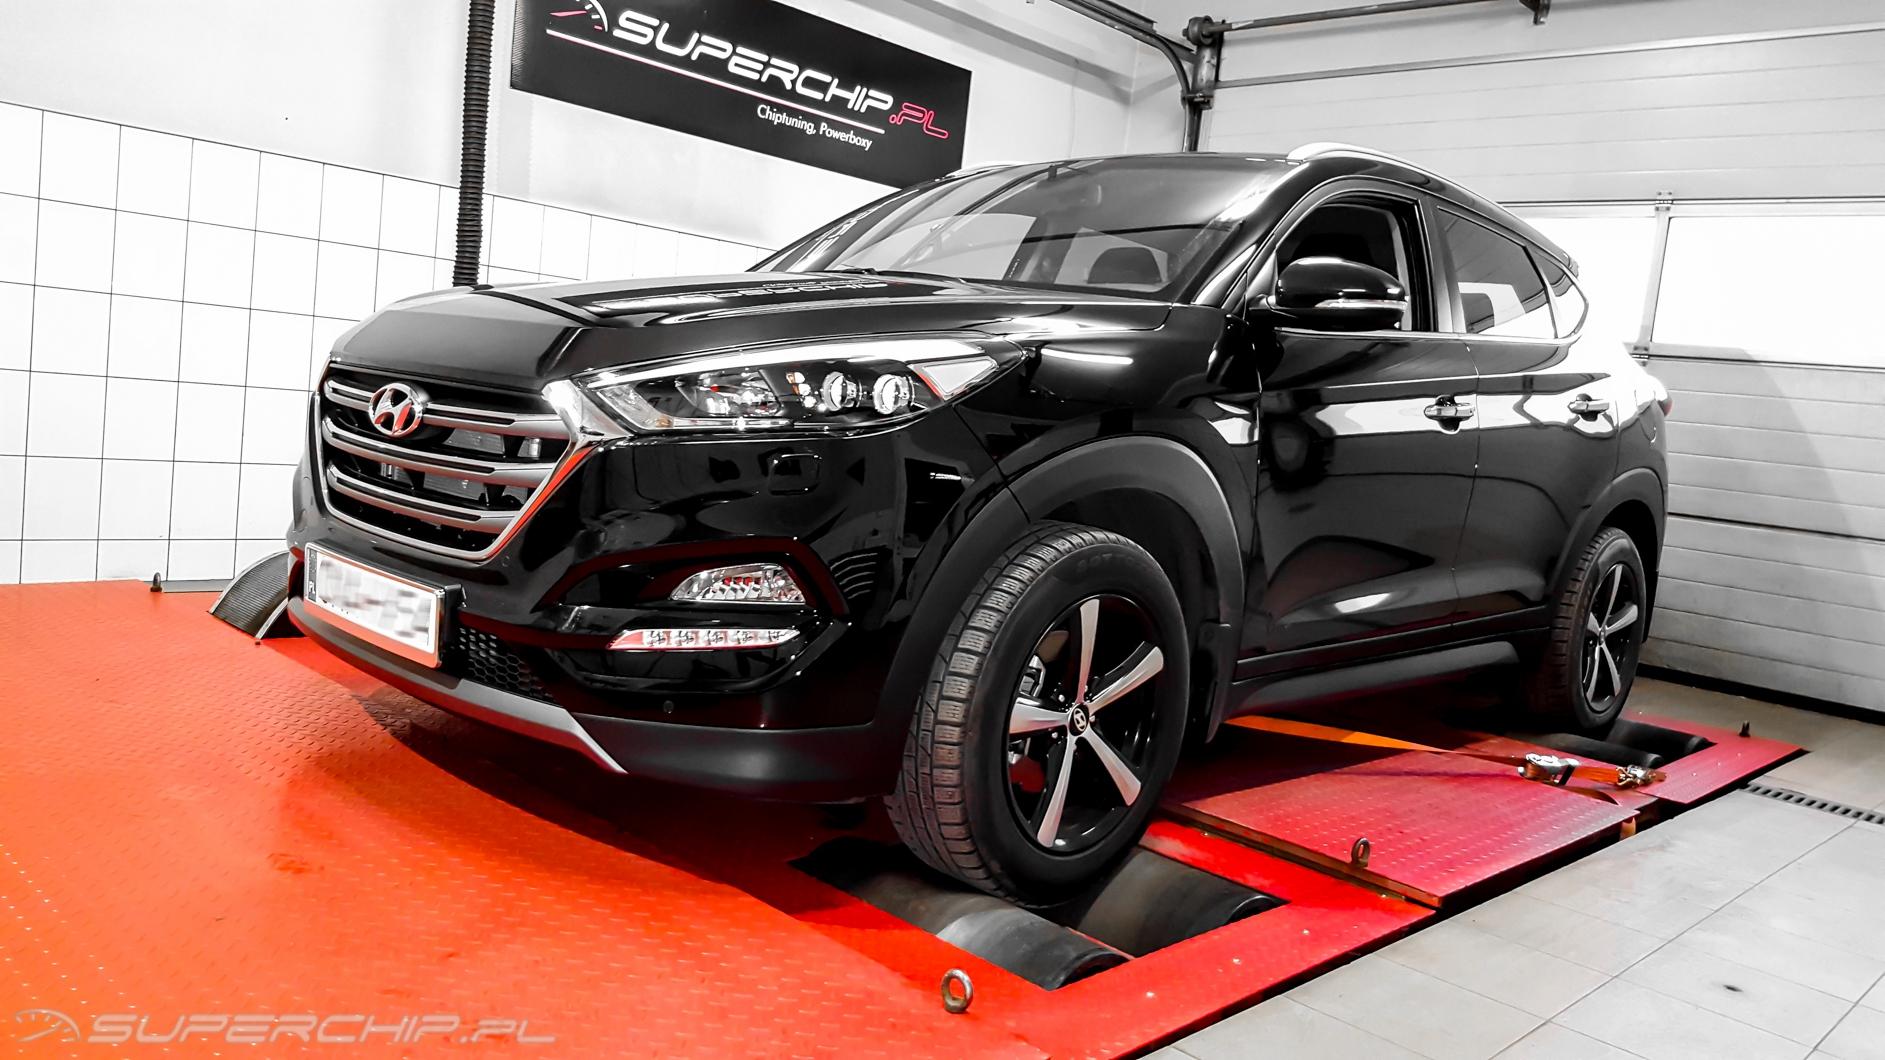 Hyundai Tucson 1.7 CRDi 115 KM PowerBox